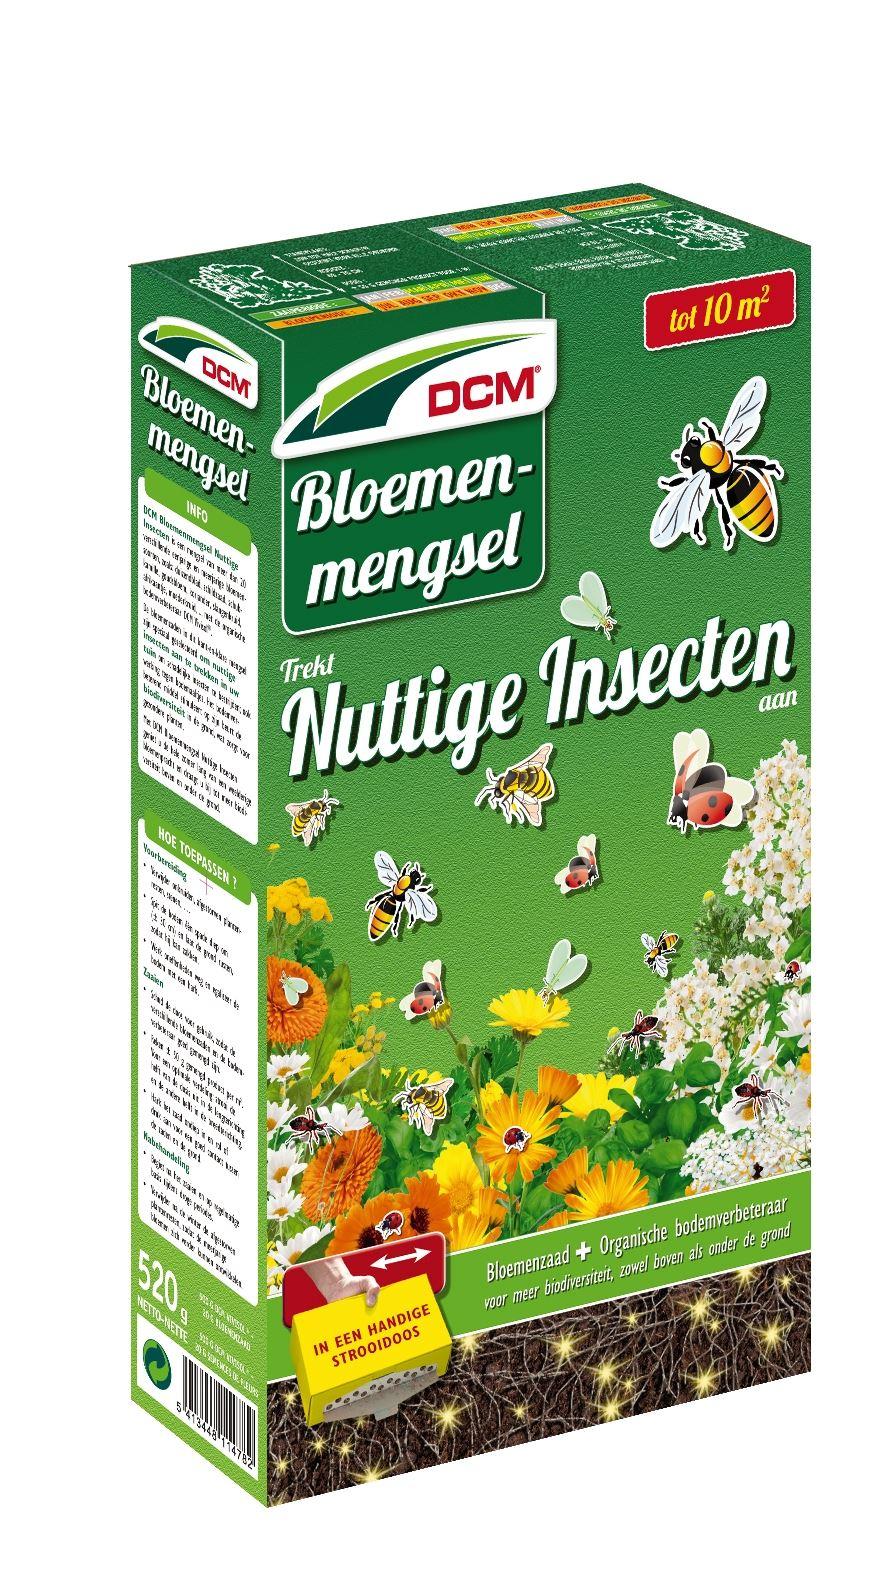 Bloemenmix nuttige insecten - 520gr